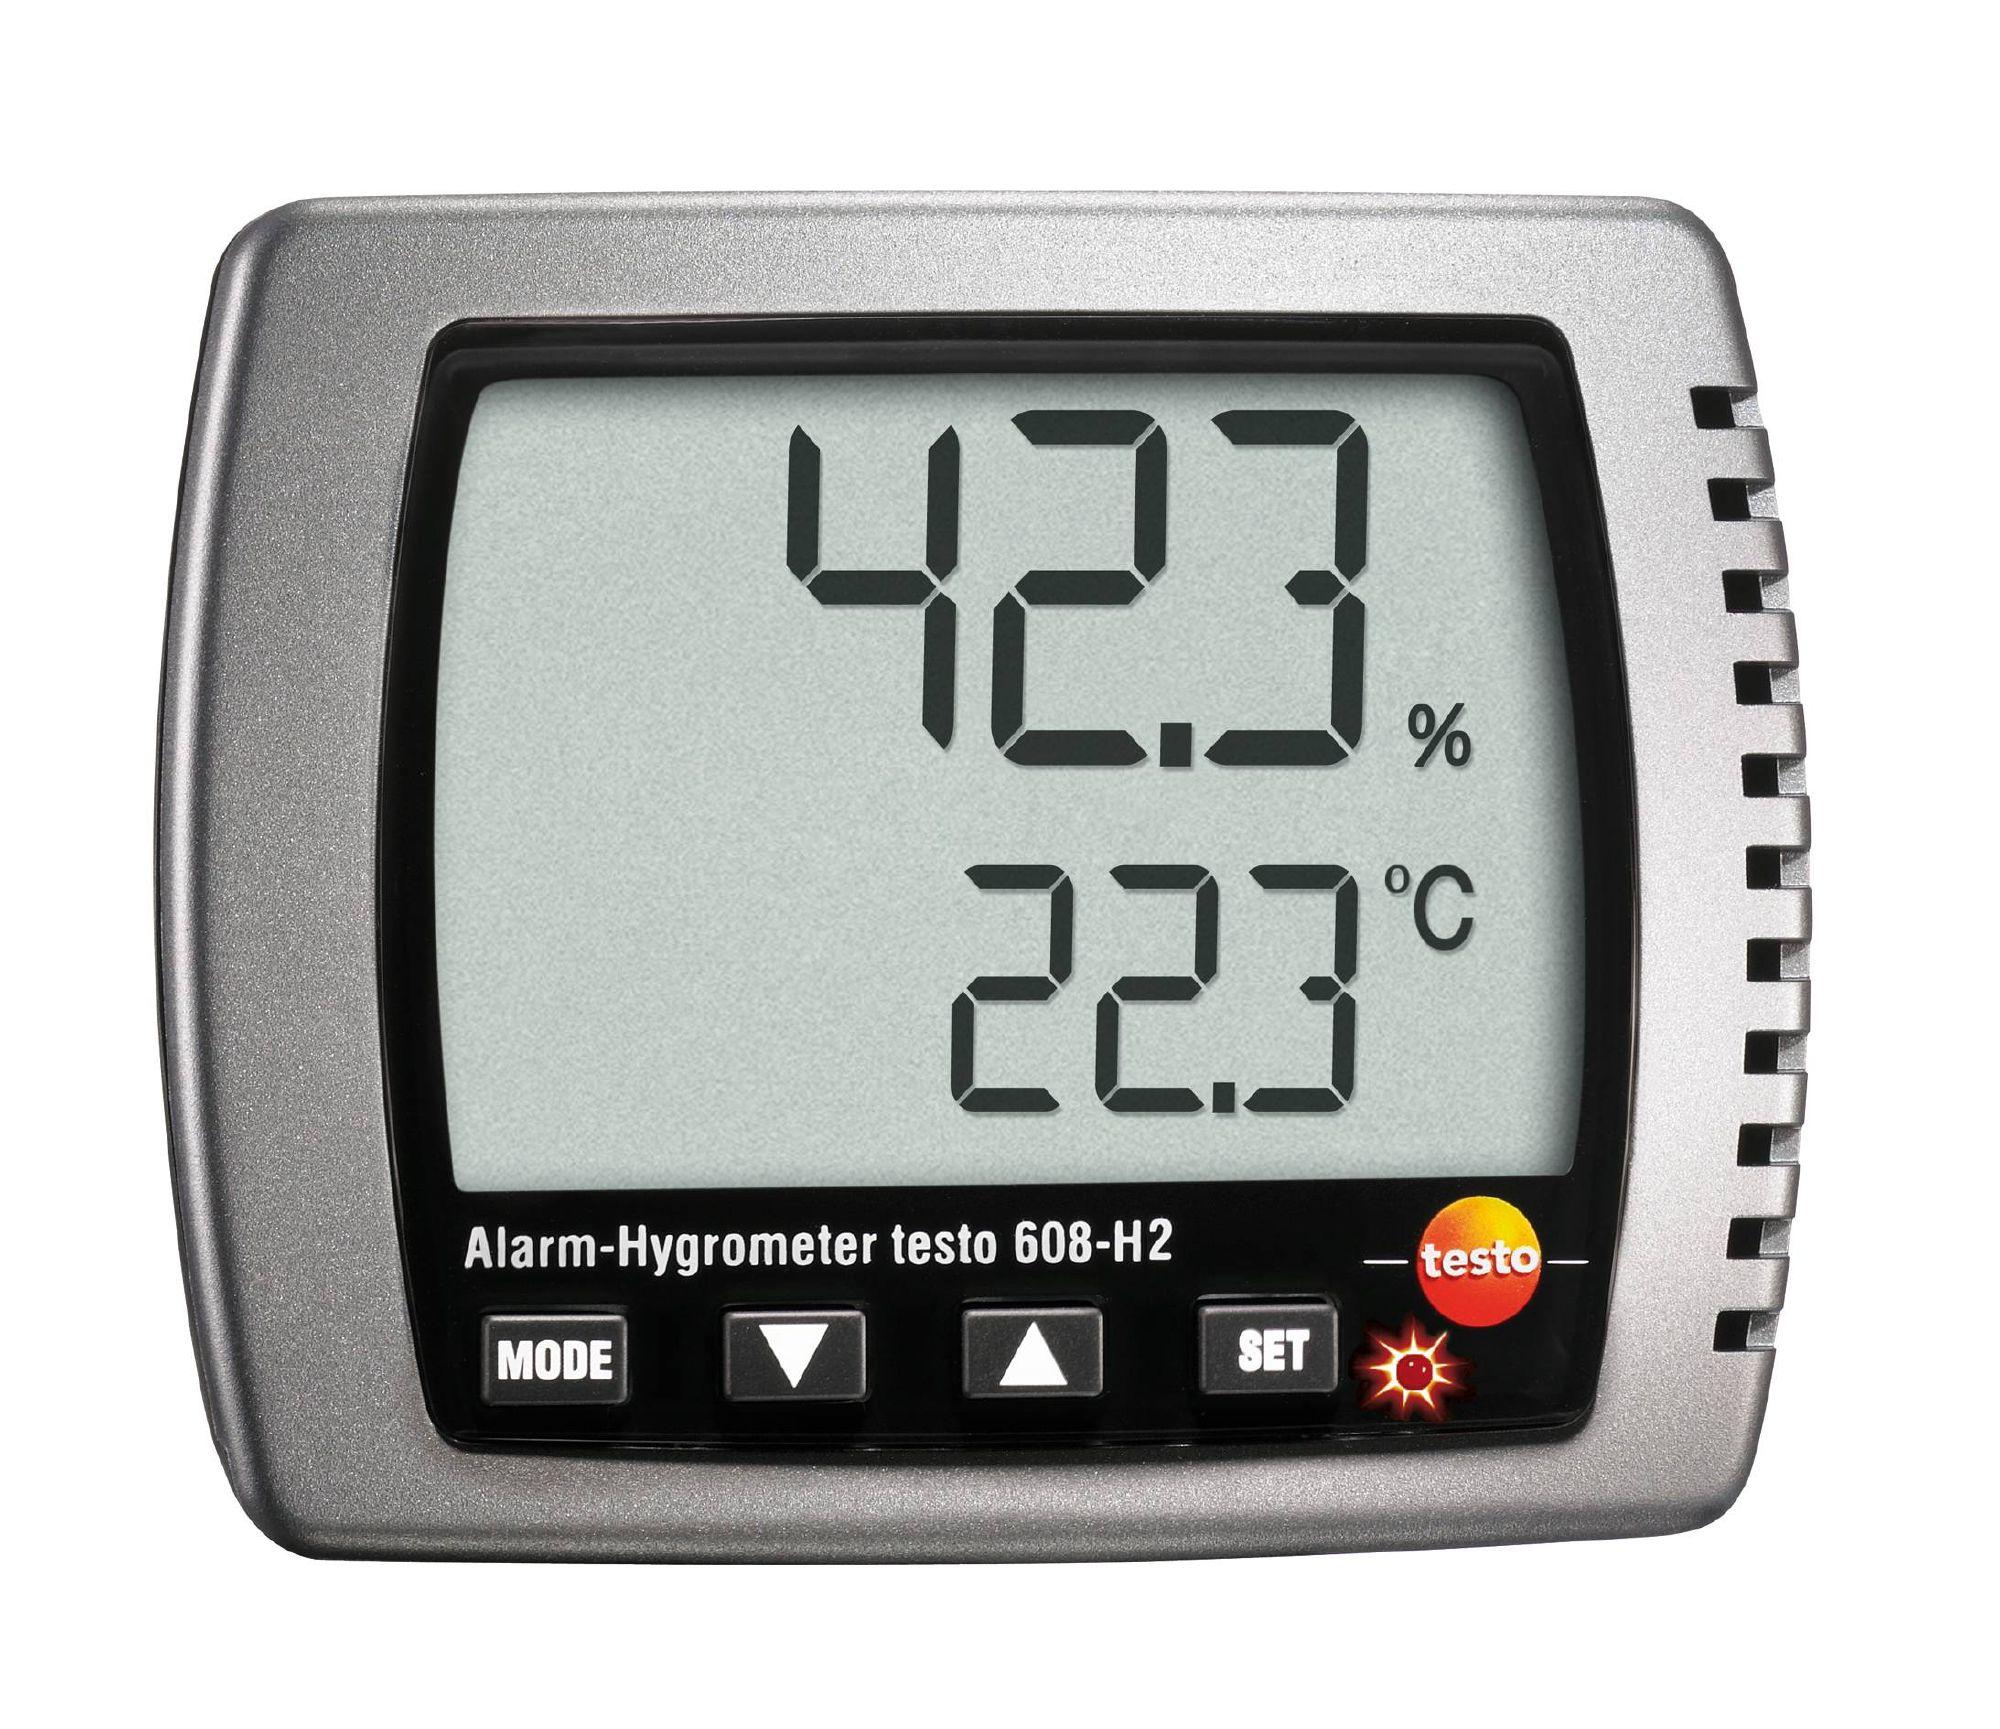 TESTO 608 -H2 - Thermohygrometer